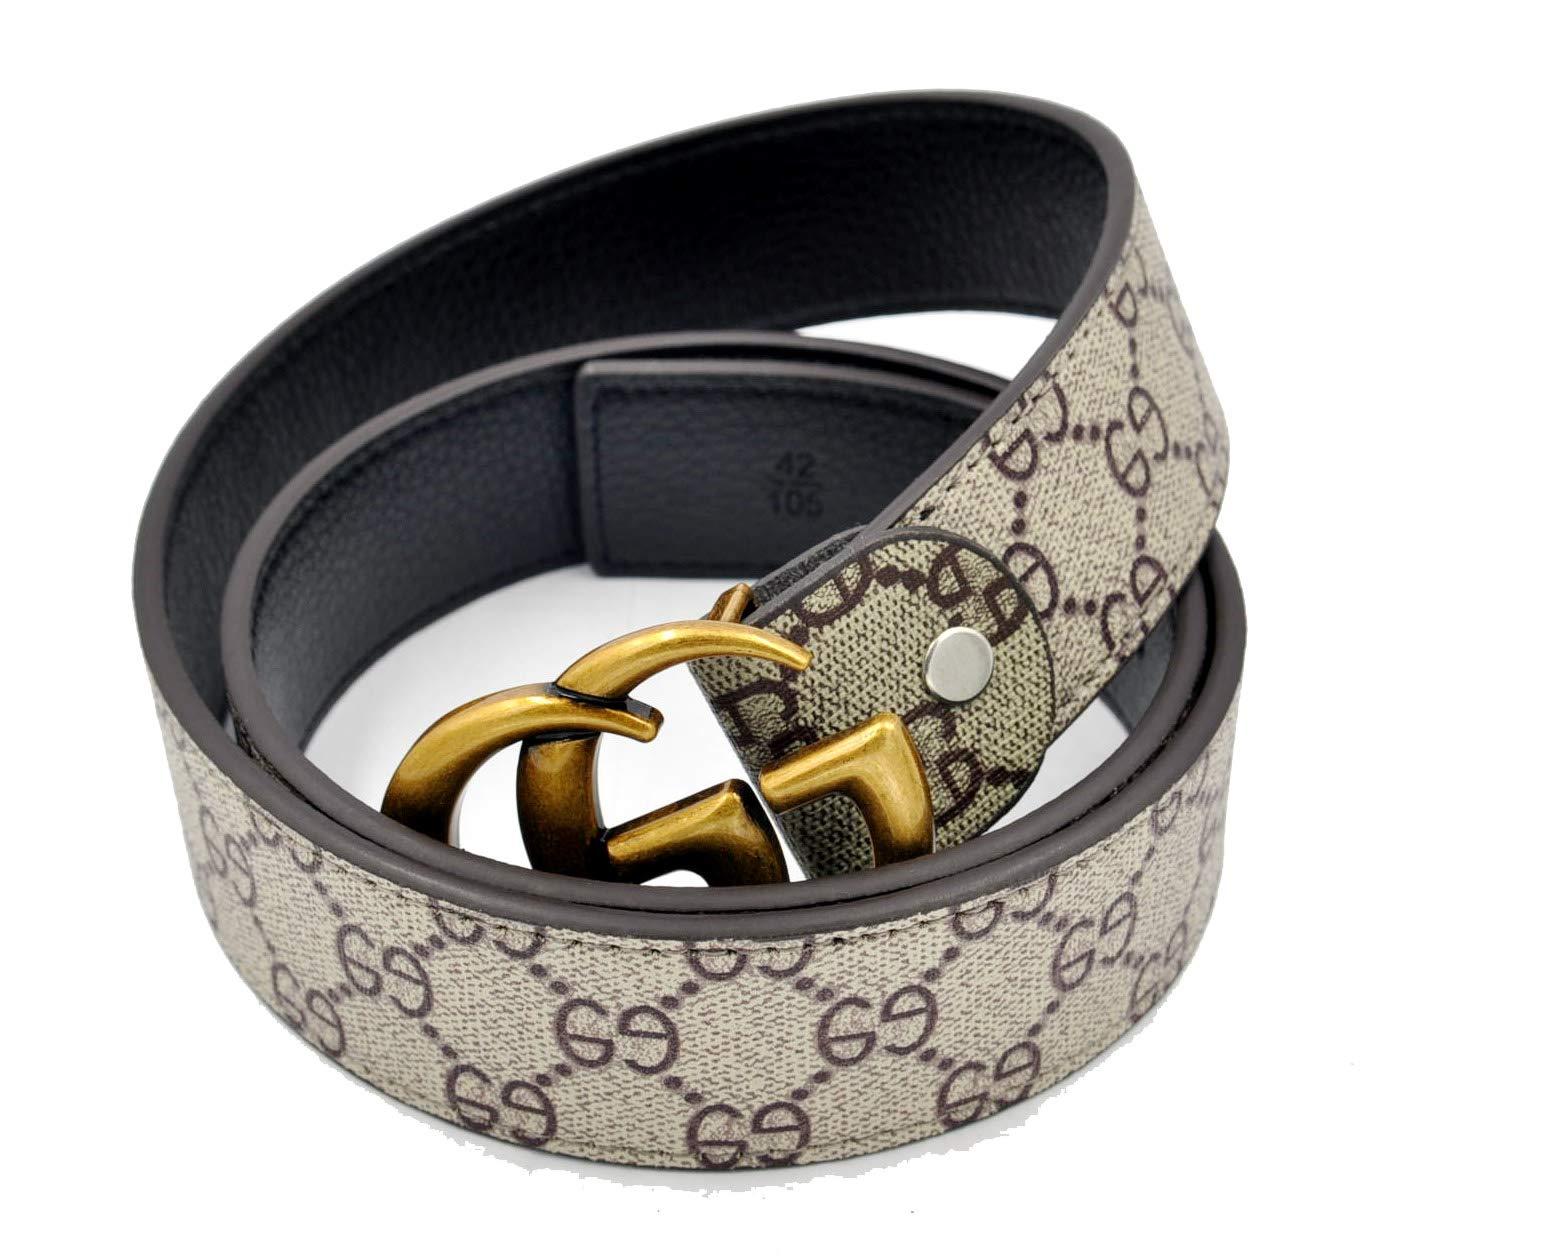 Unisex Men Women Fashion GG Leather Copper Style Buckle Resizeable Belt (125CM [Waist 35''-40''], Brown Belt)